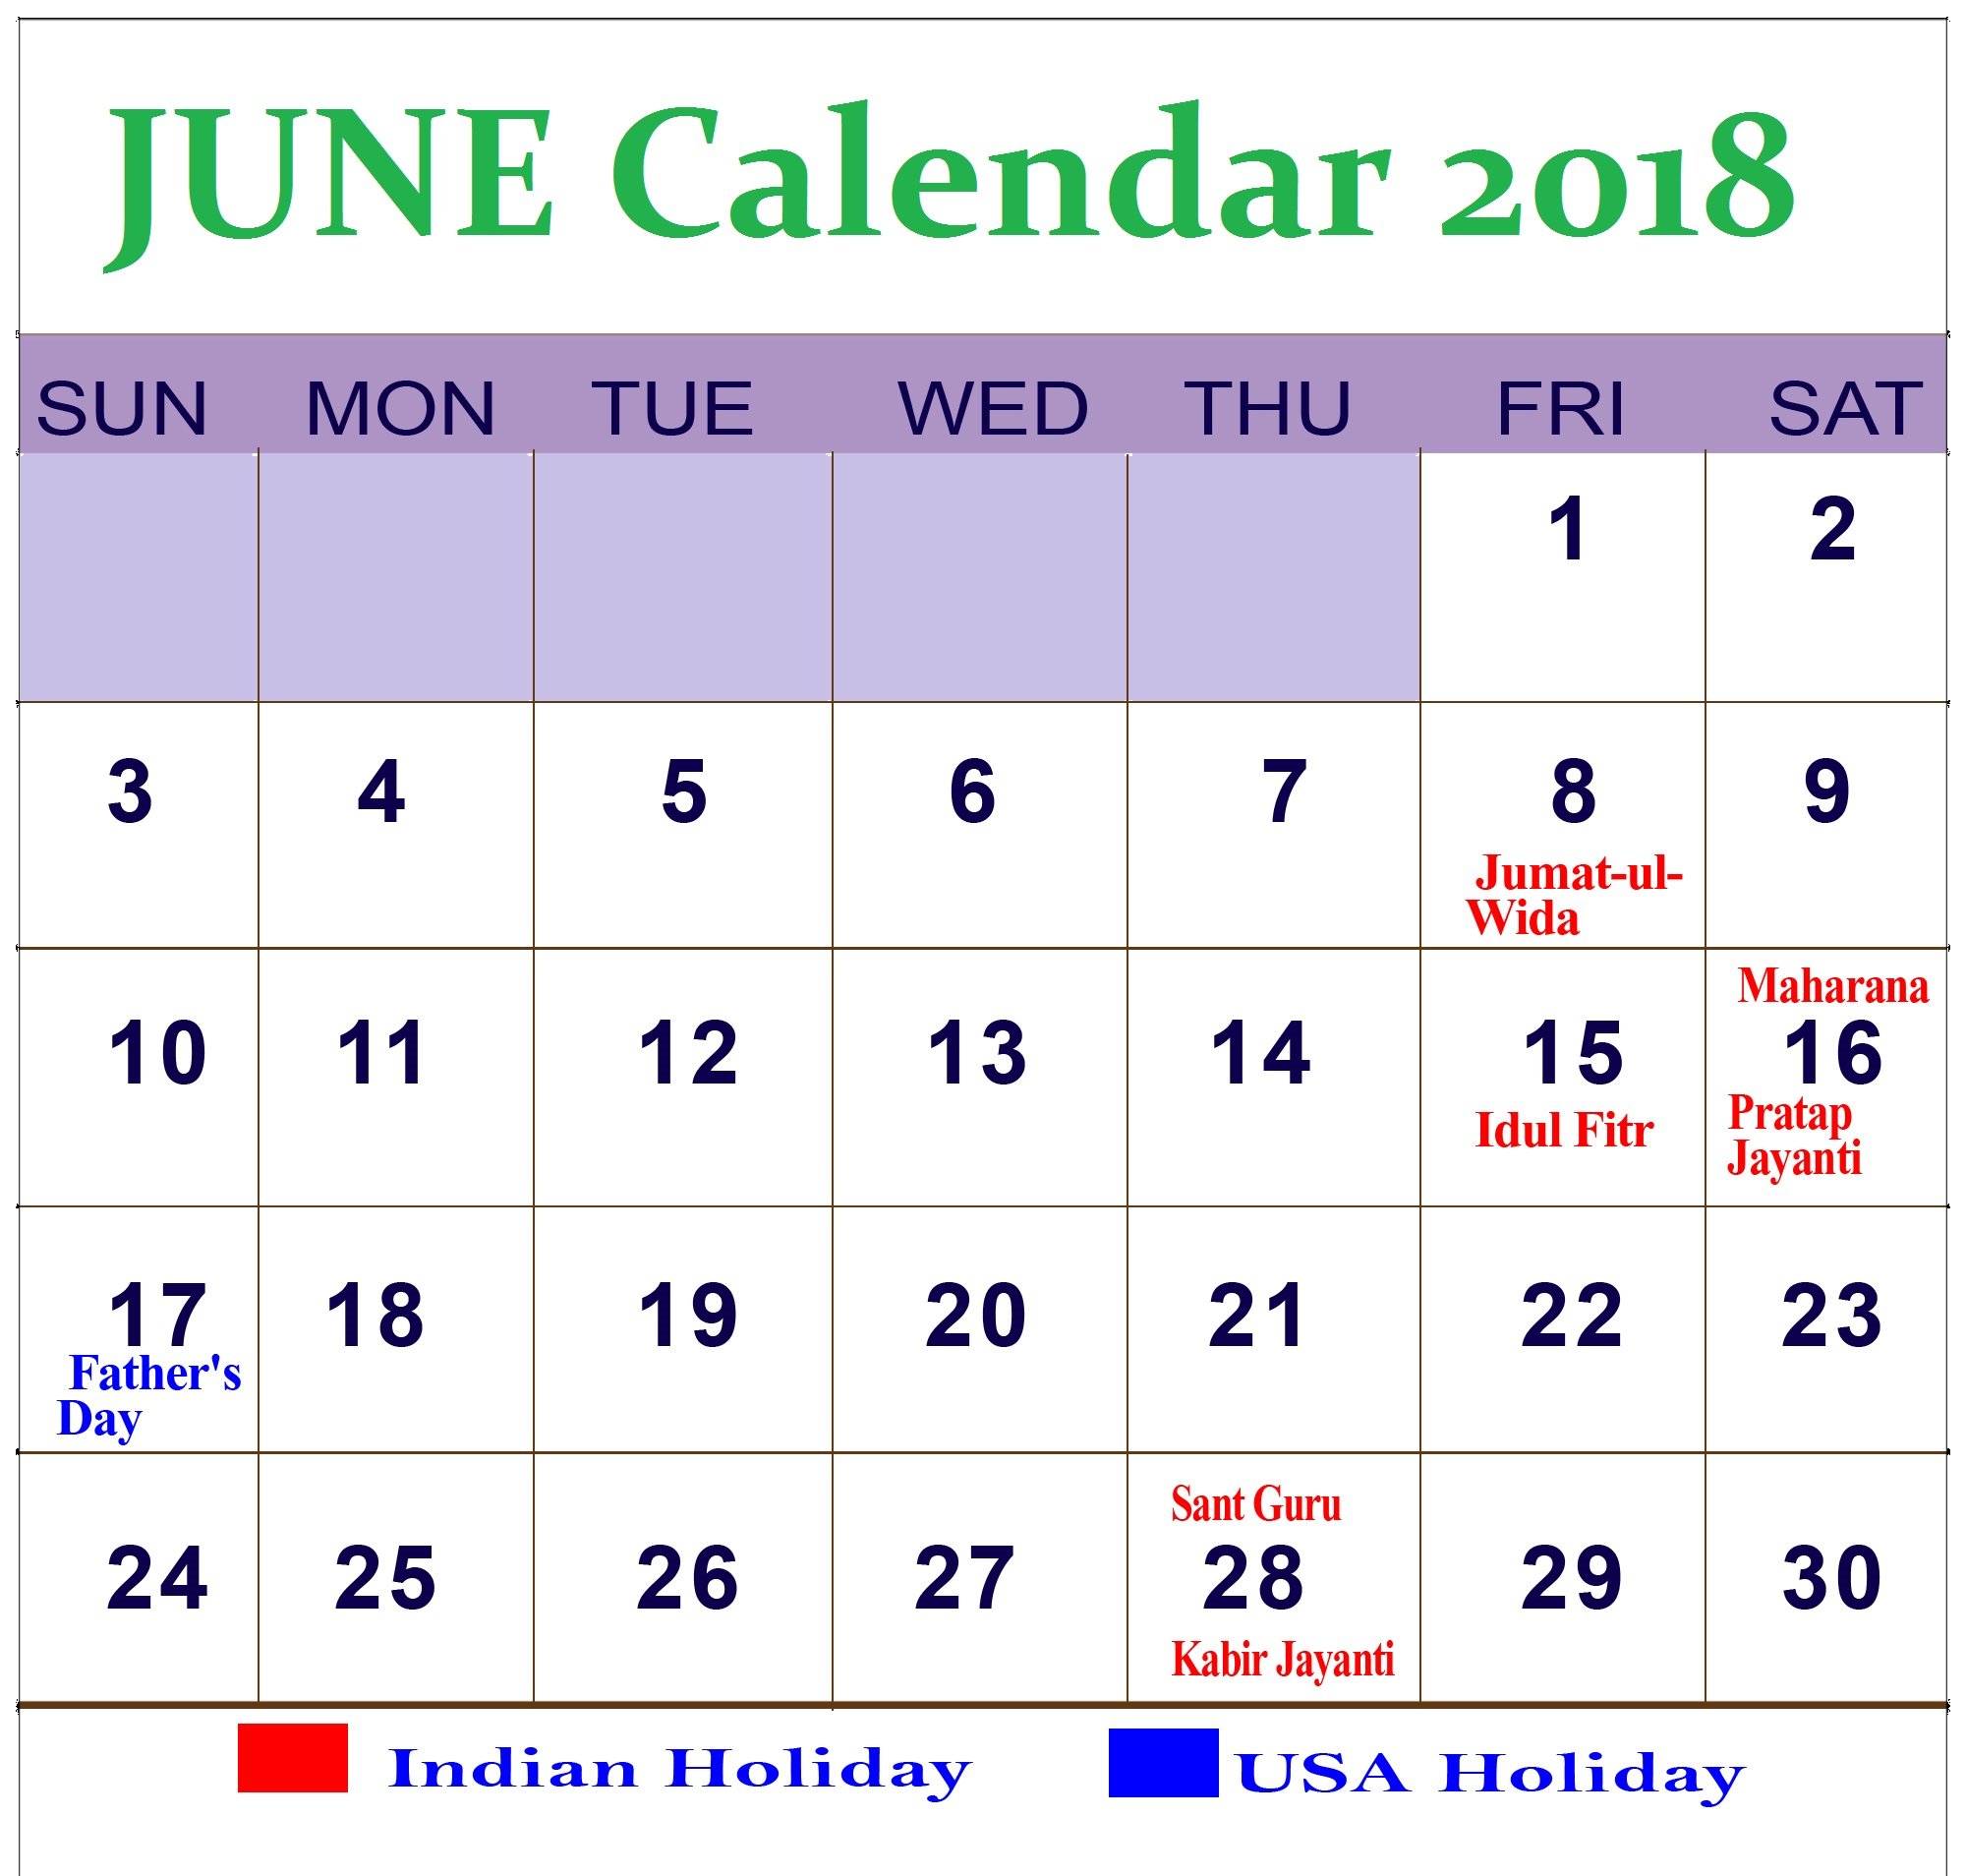 June Calendar Download 2018